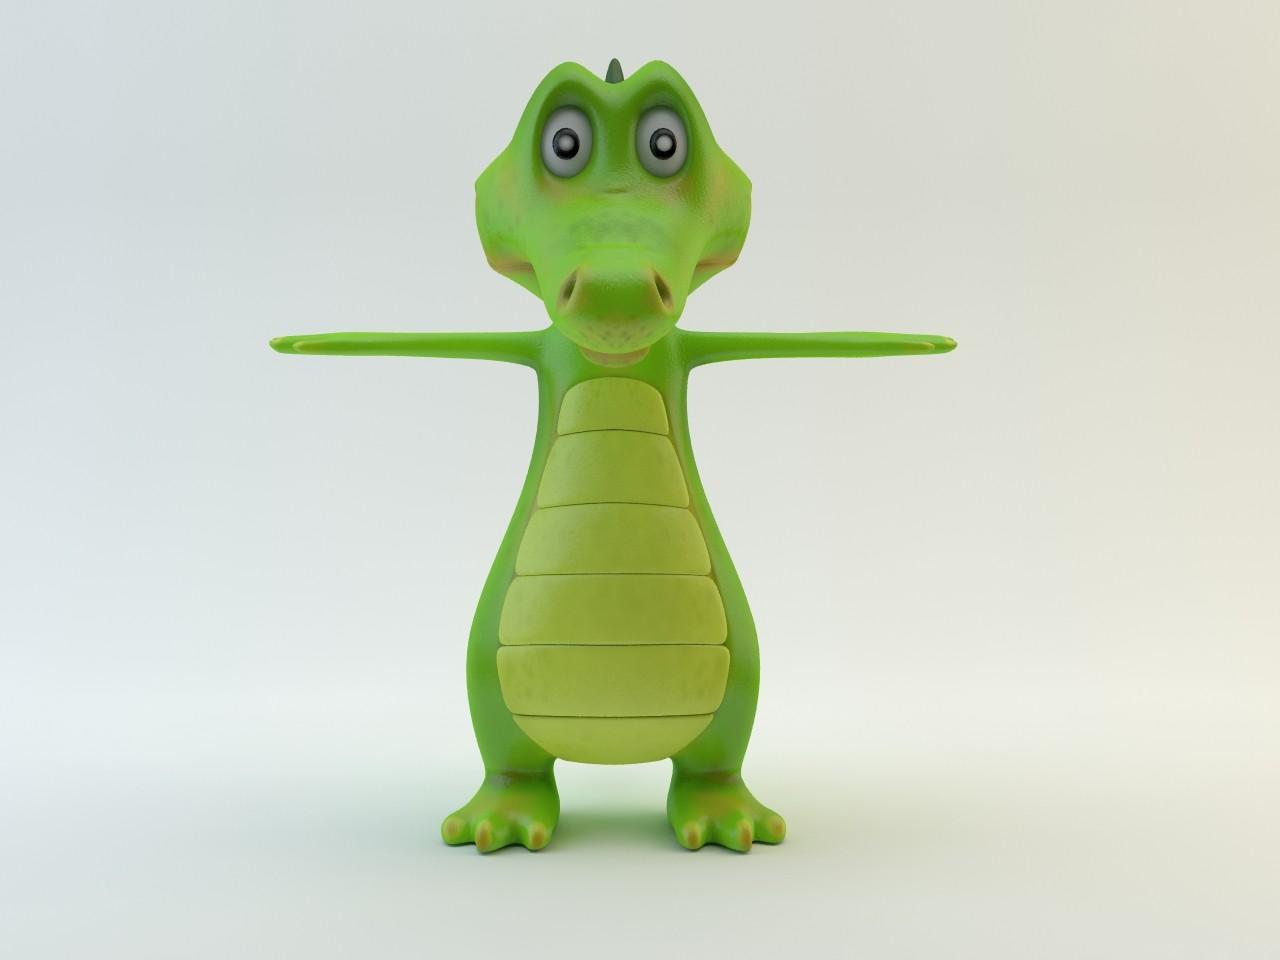 toon crocodile